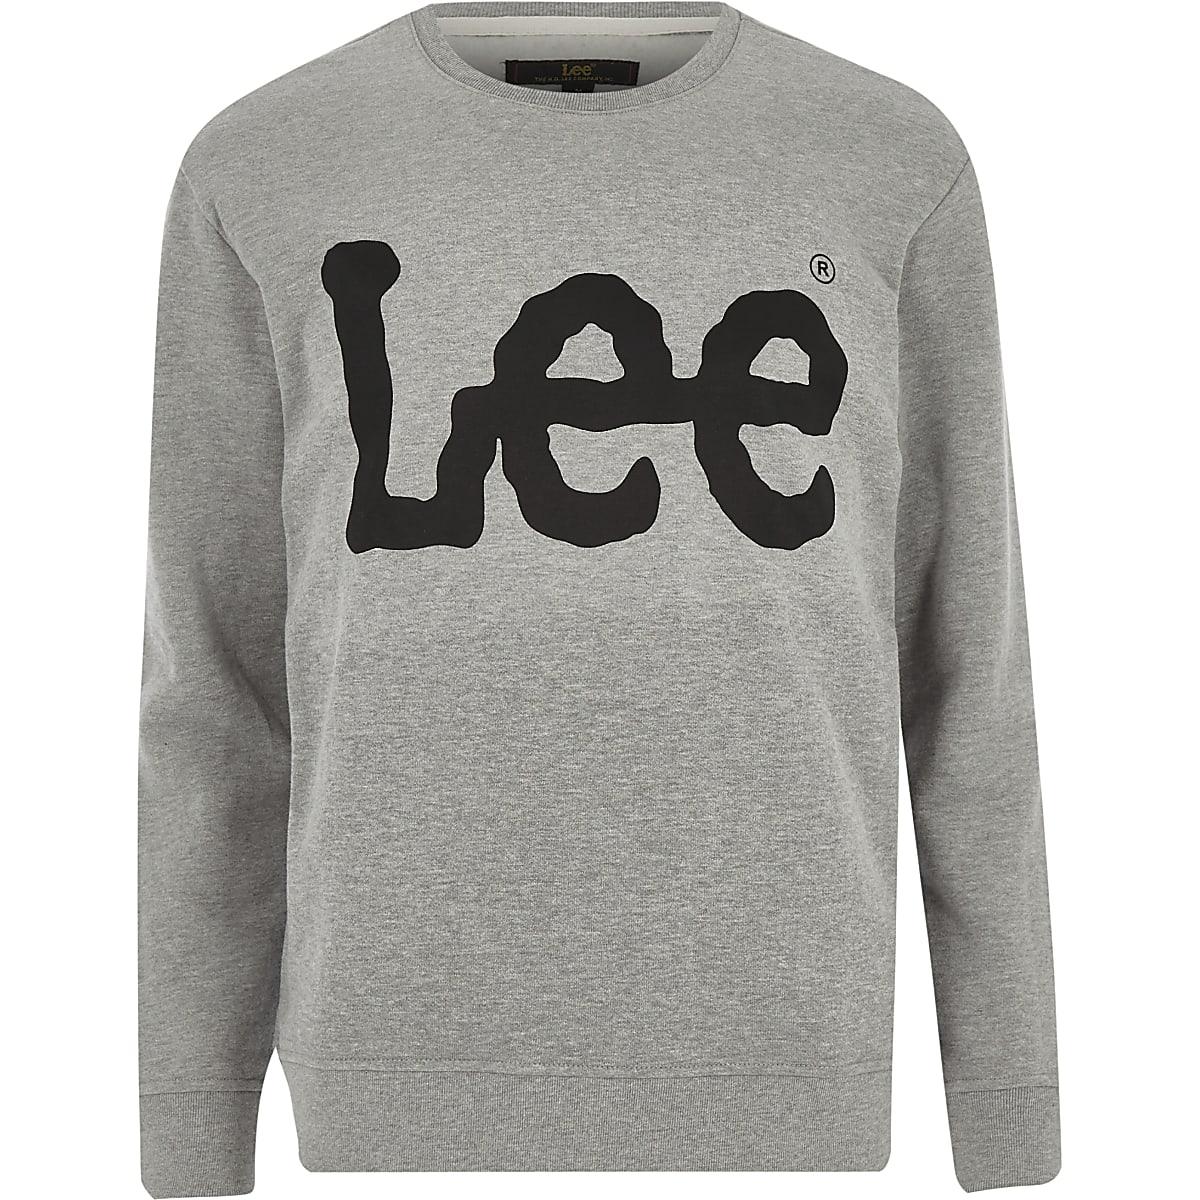 Lee grey logo print sweatshirt